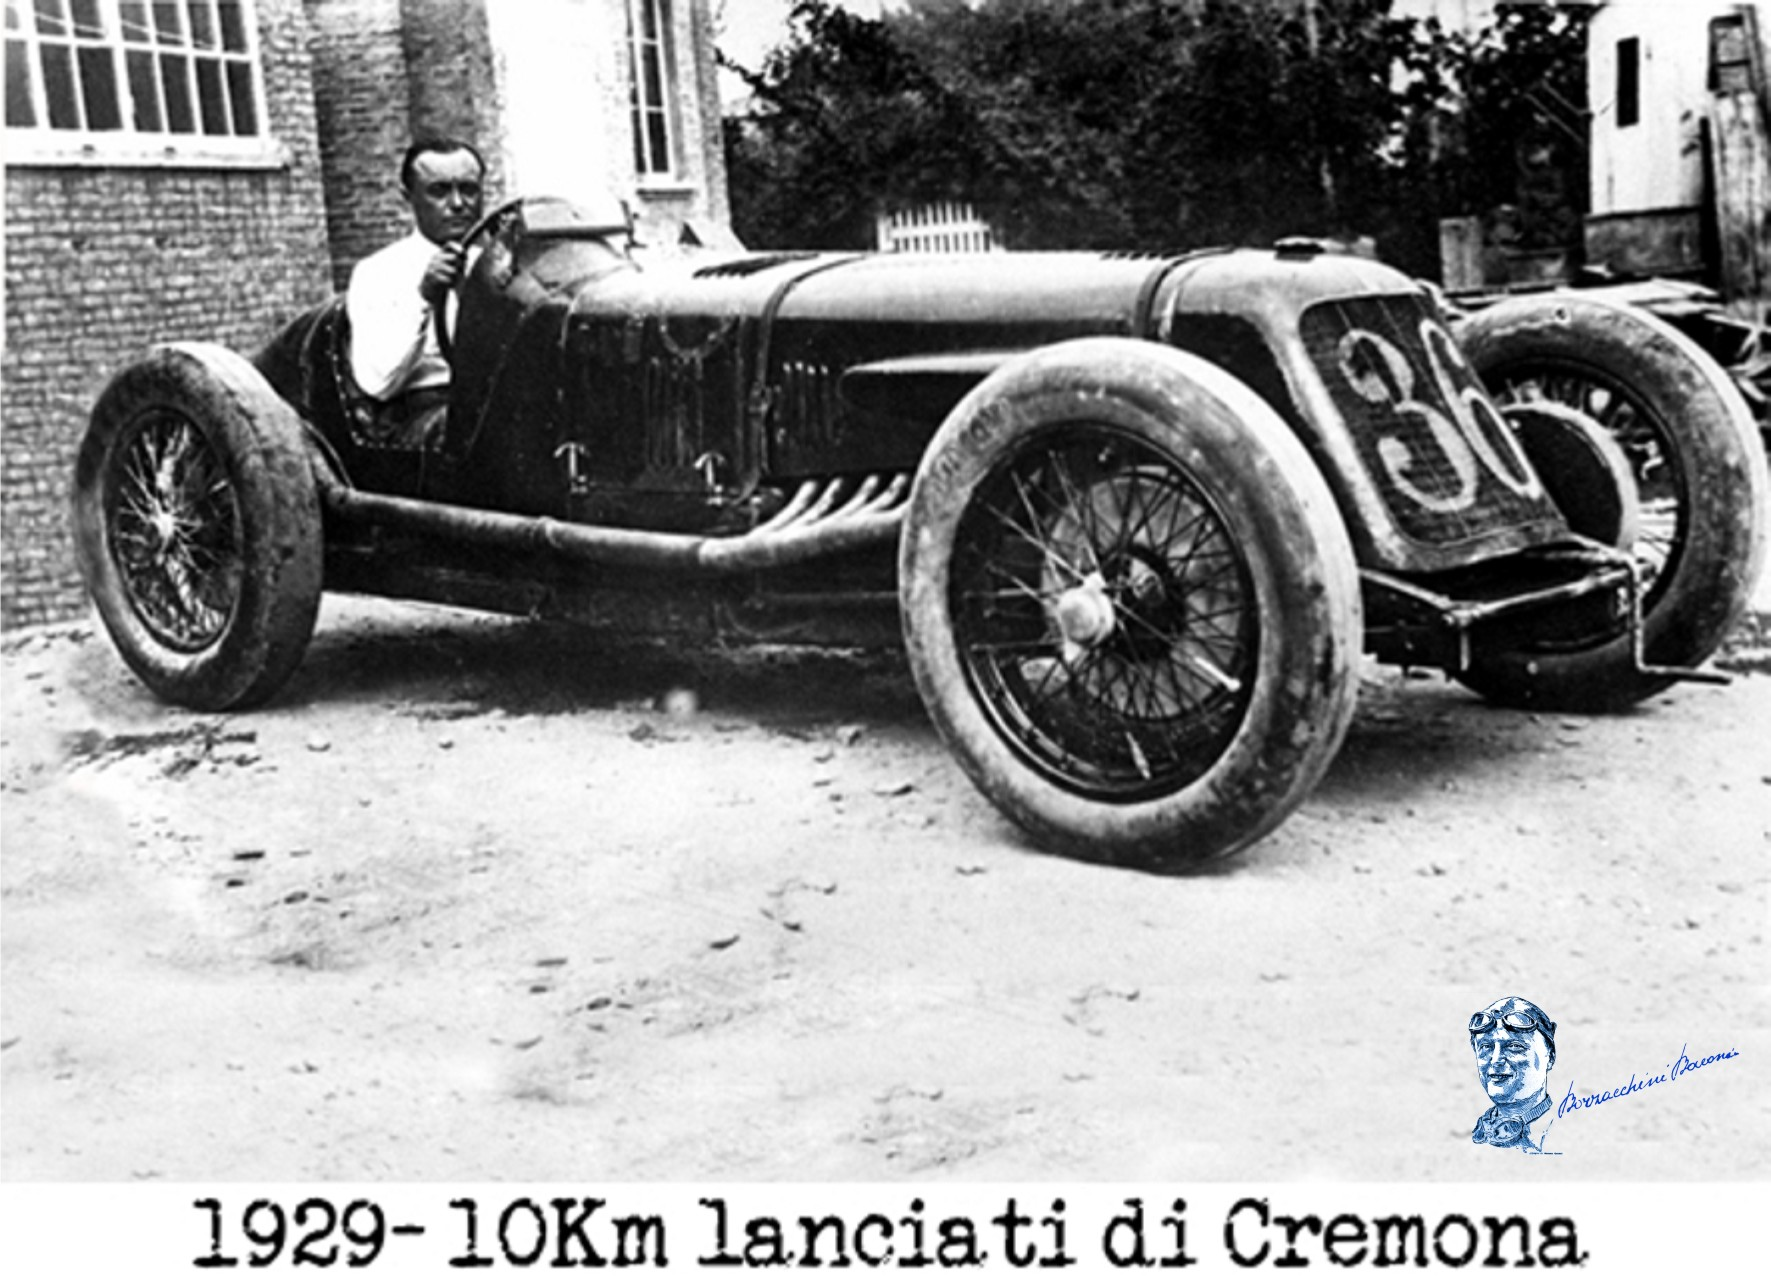 1929 record cremona